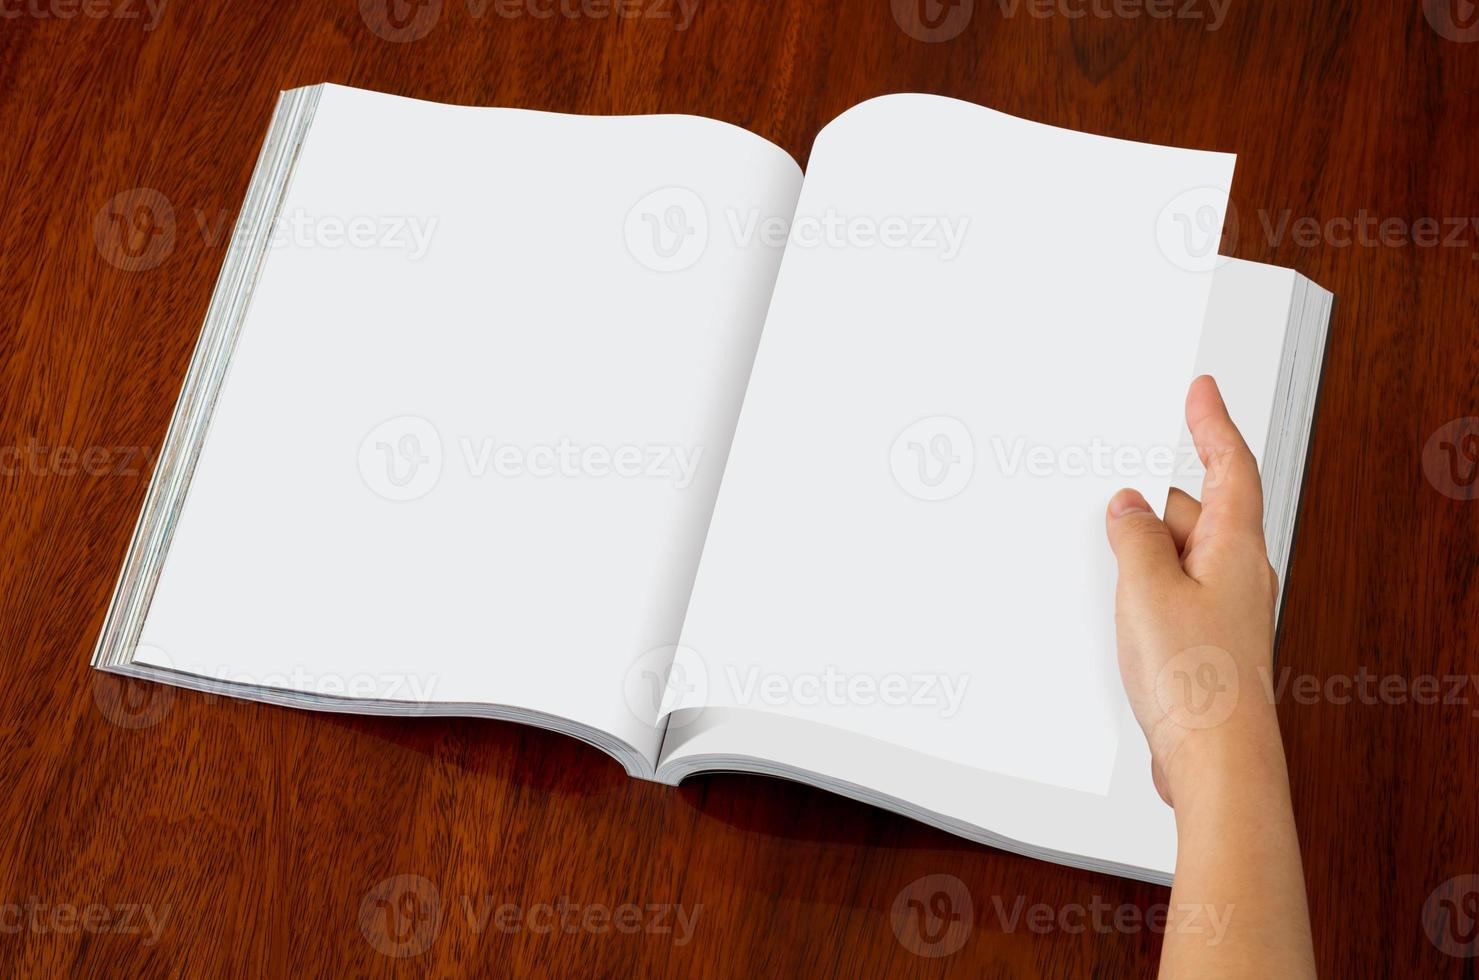 tom katalog, tidskrifter, bok håna på trä bakgrund foto